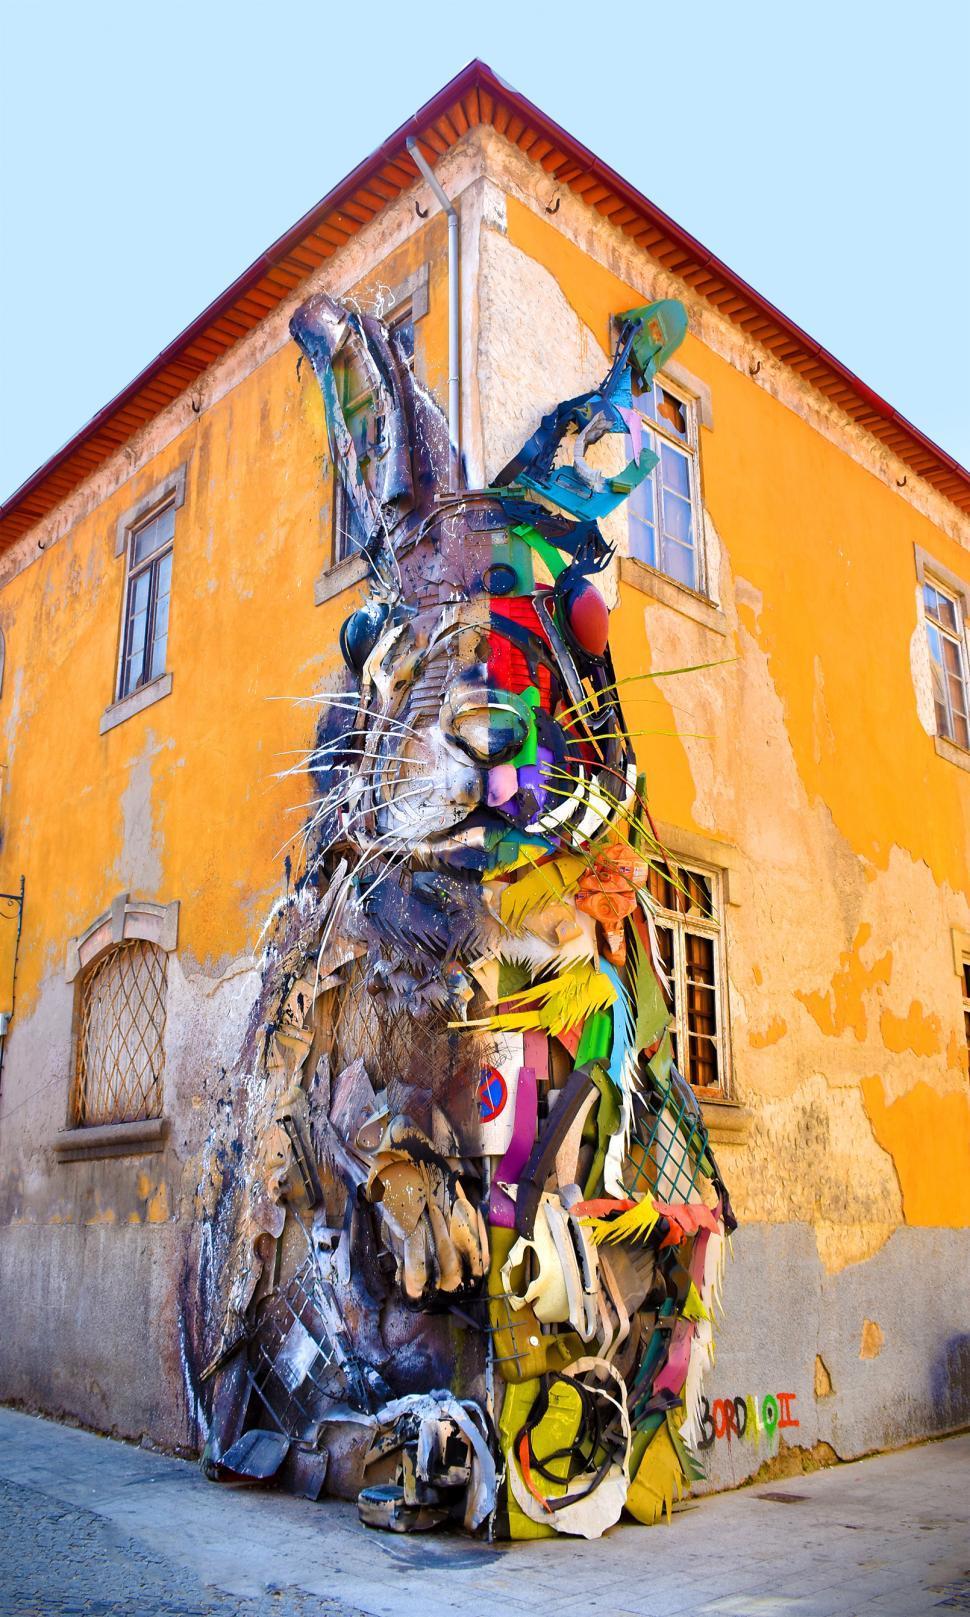 Download Free Stock HD Photo of Urban Art - Porto - V.N. Gaia - Old Port Wine Cellars Online